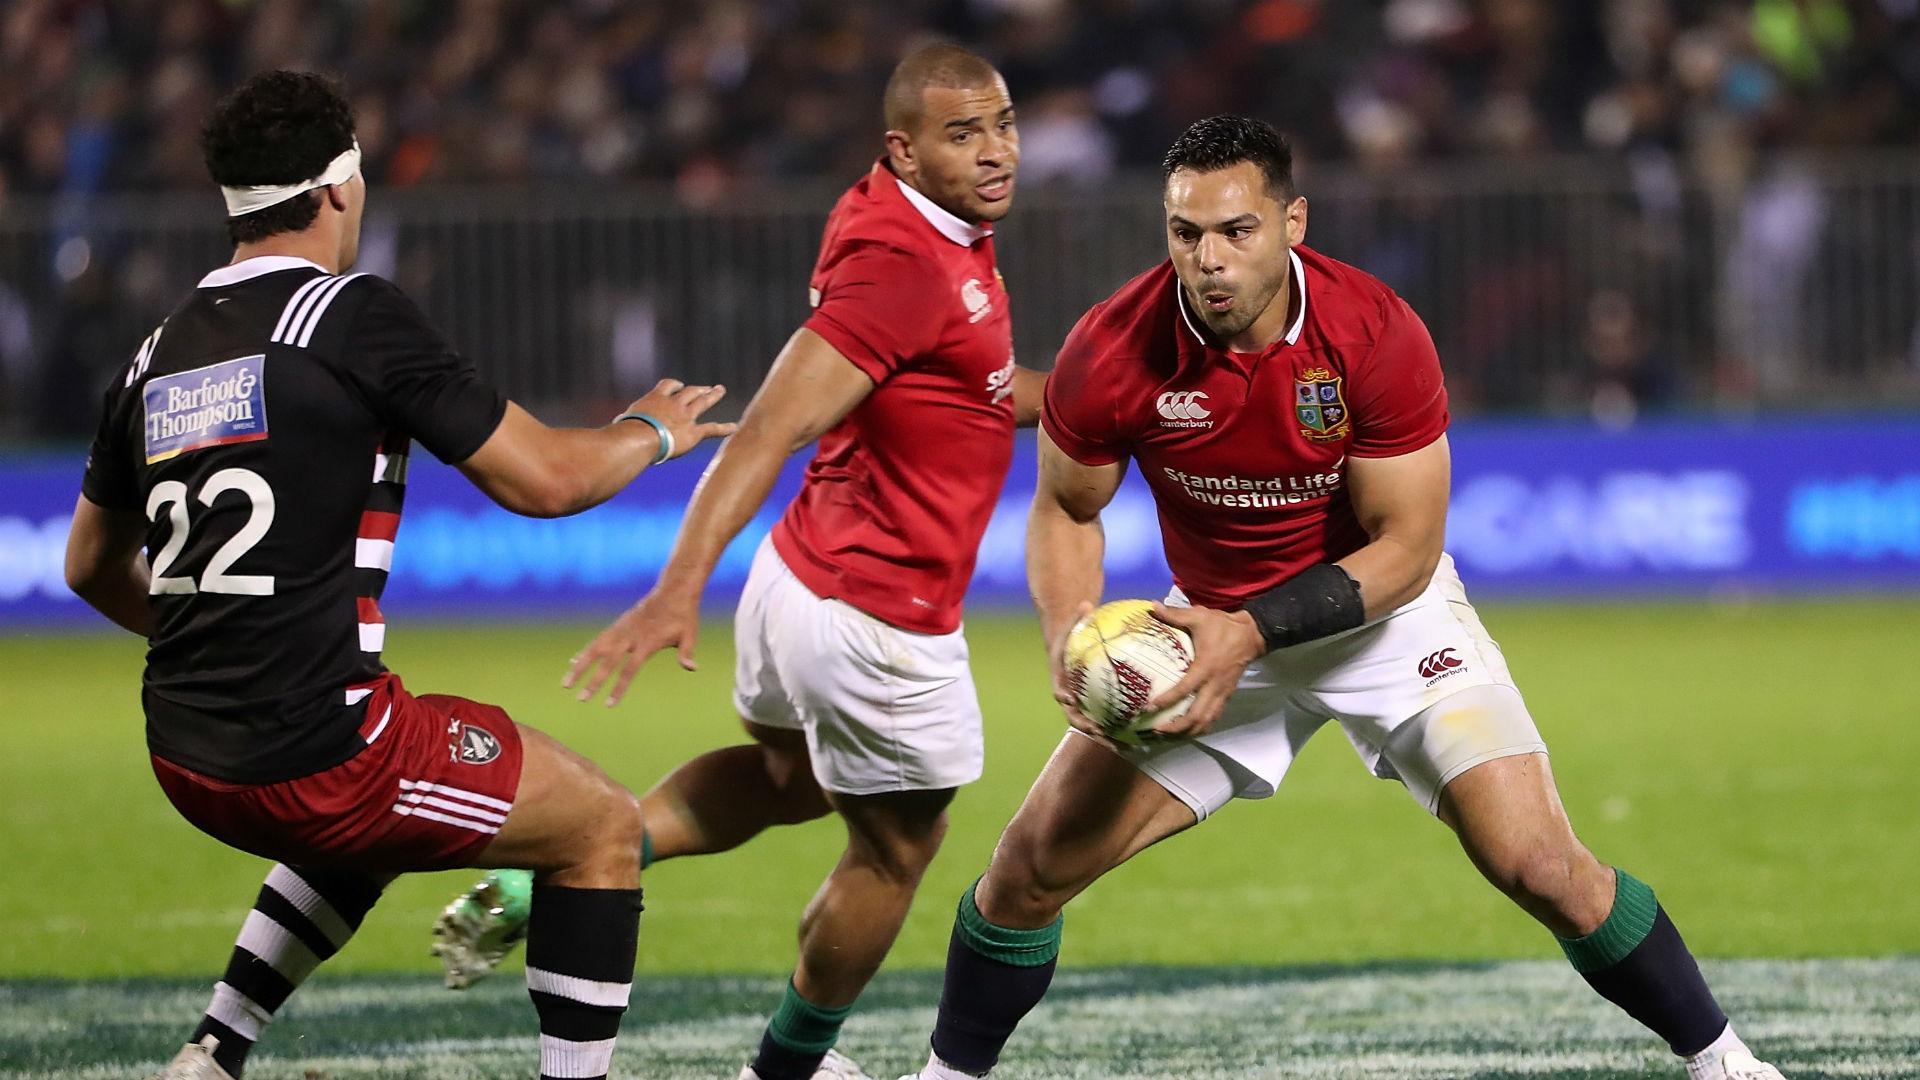 Watson try sends British & Irish Lions on their way